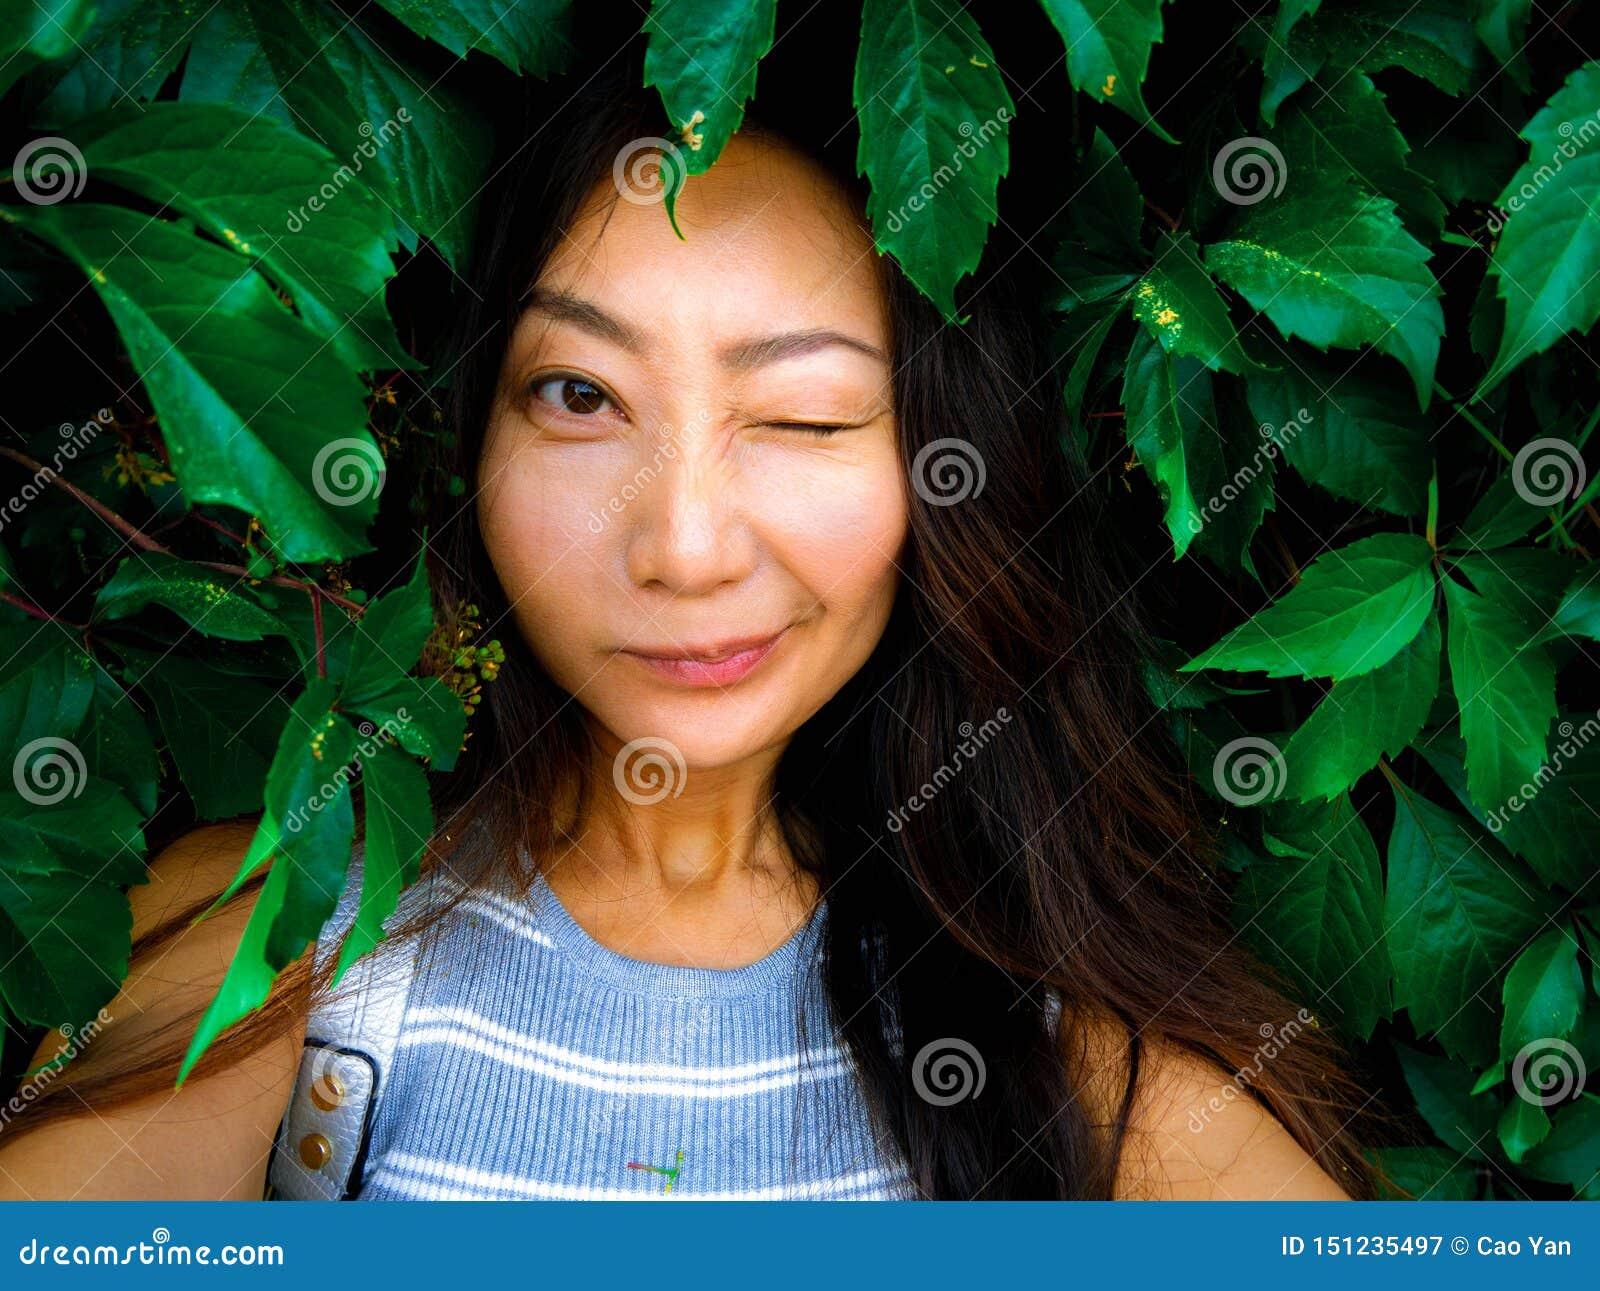 Portrait of a cute asian girl taking selfie on a green grape leaf background.